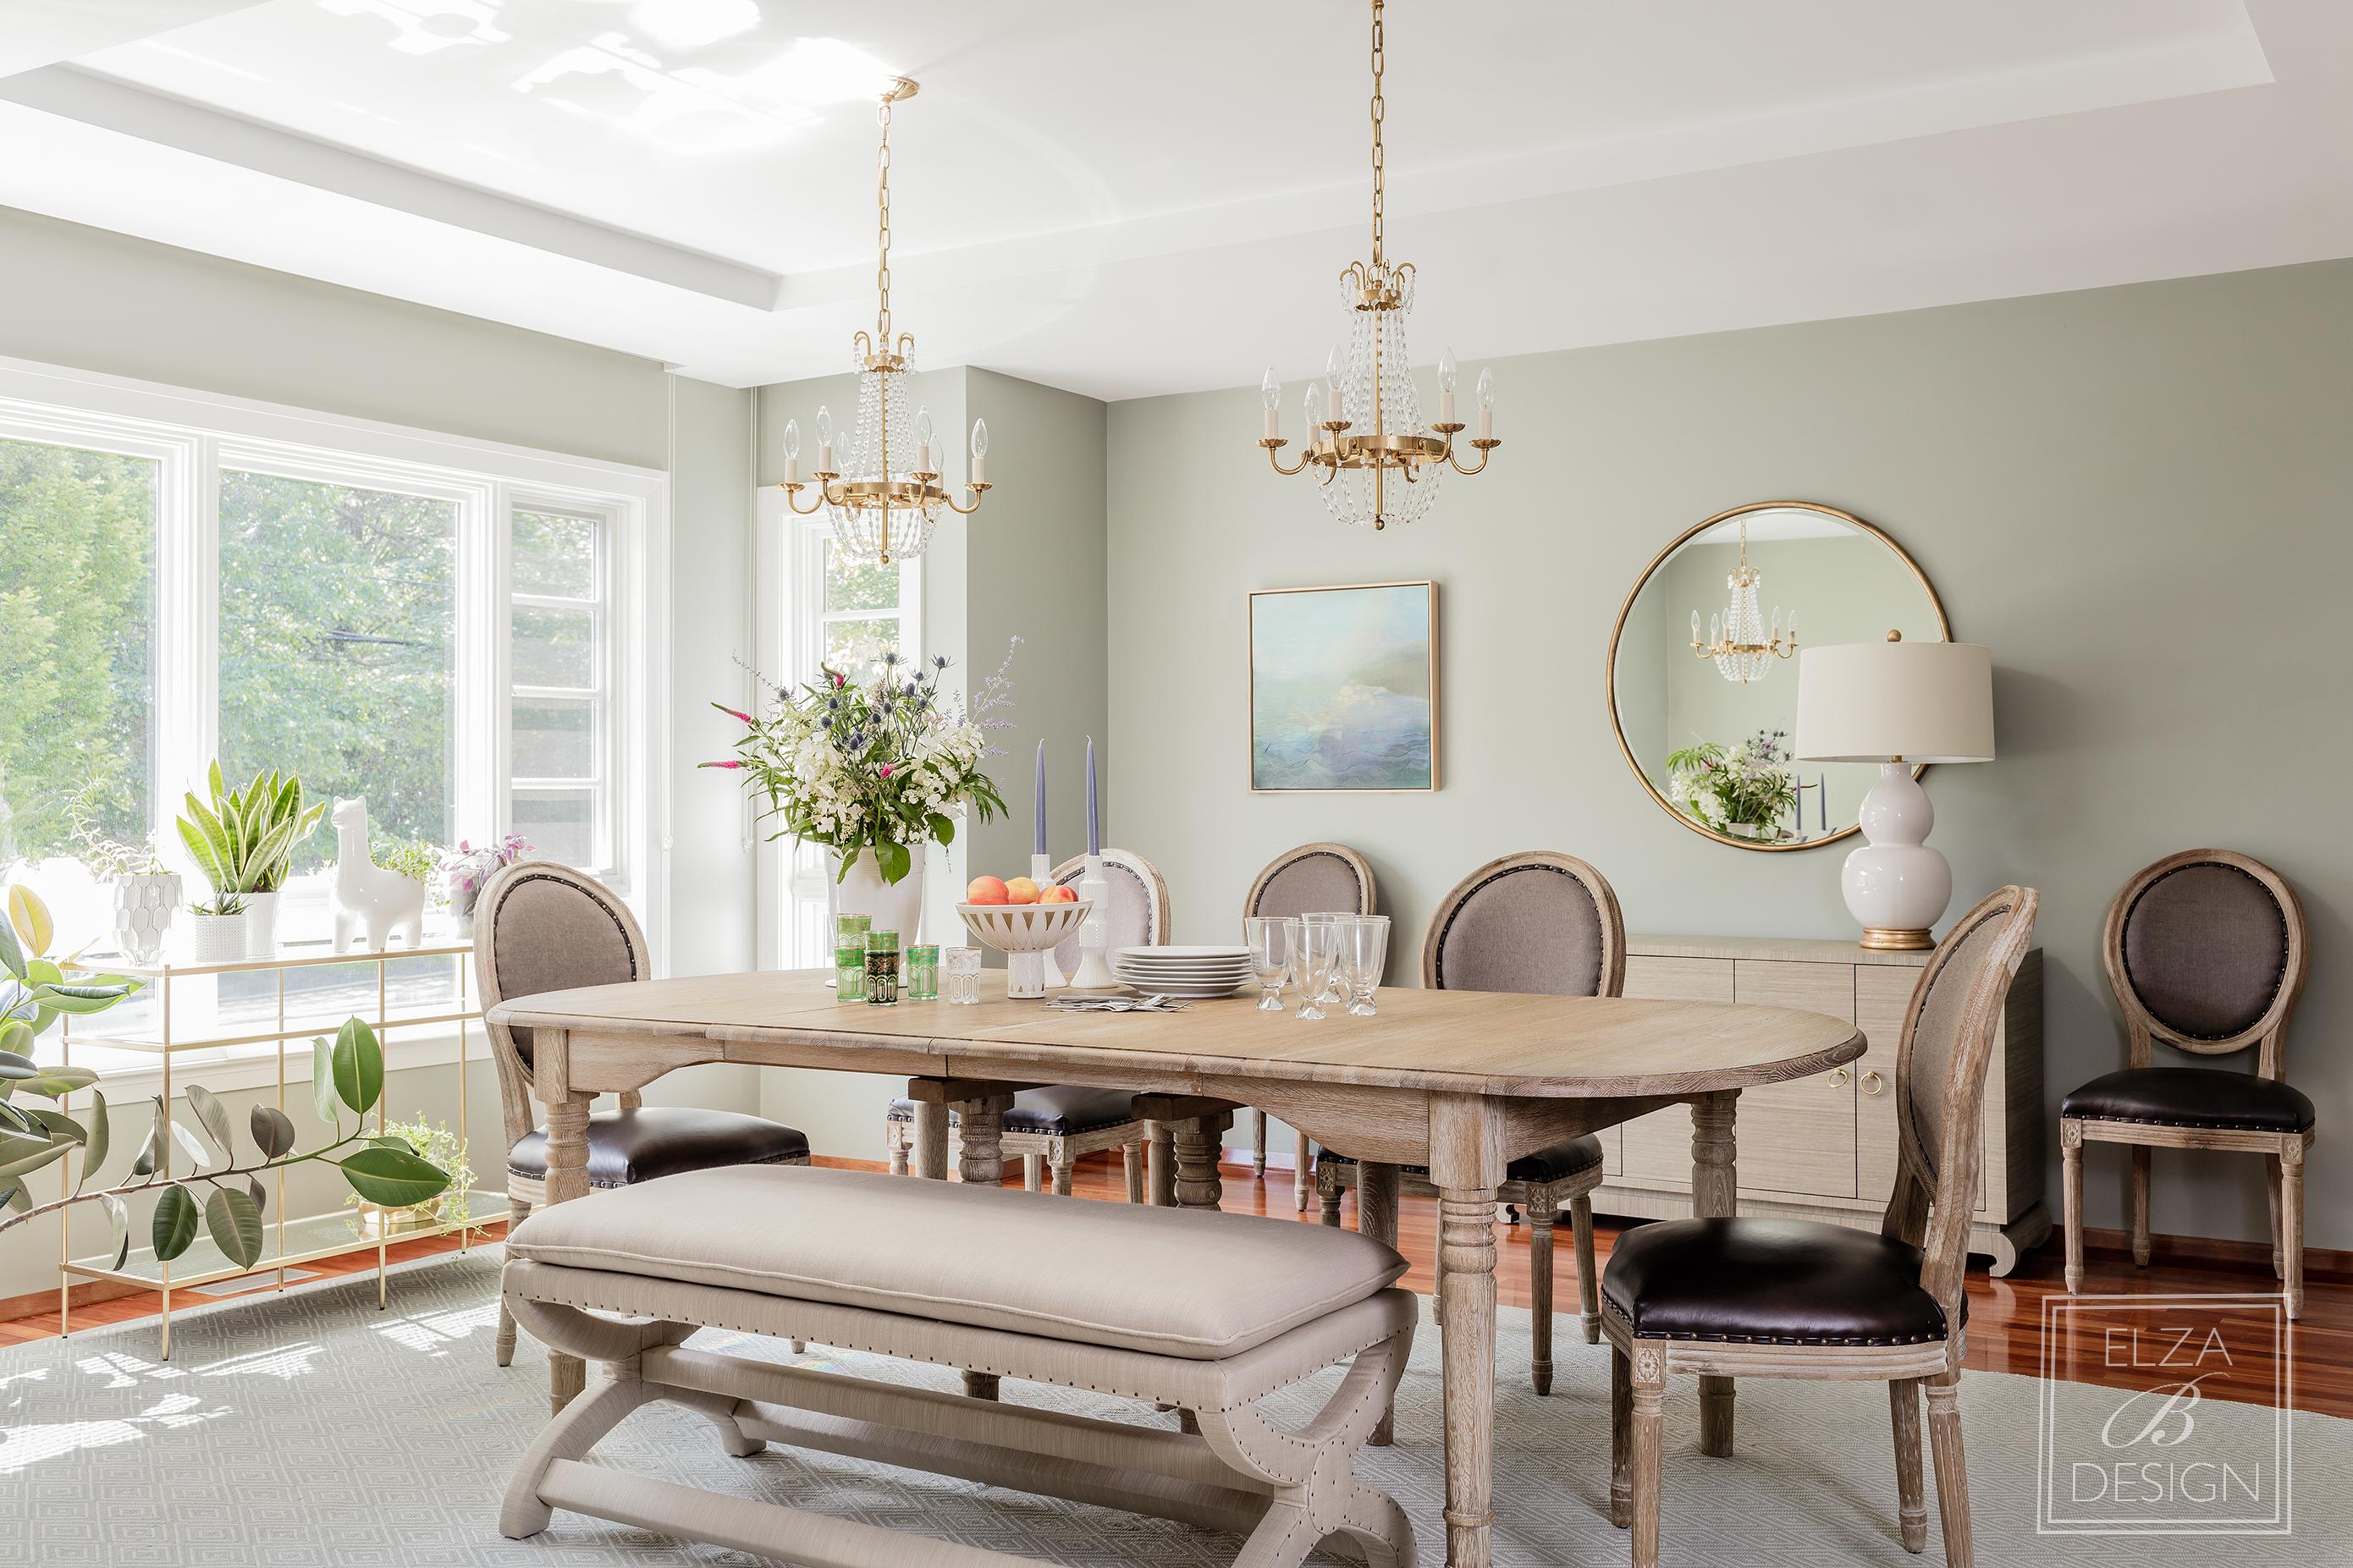 The Newton Home: An Elegant Family Affair by Elza B Design, Inc.